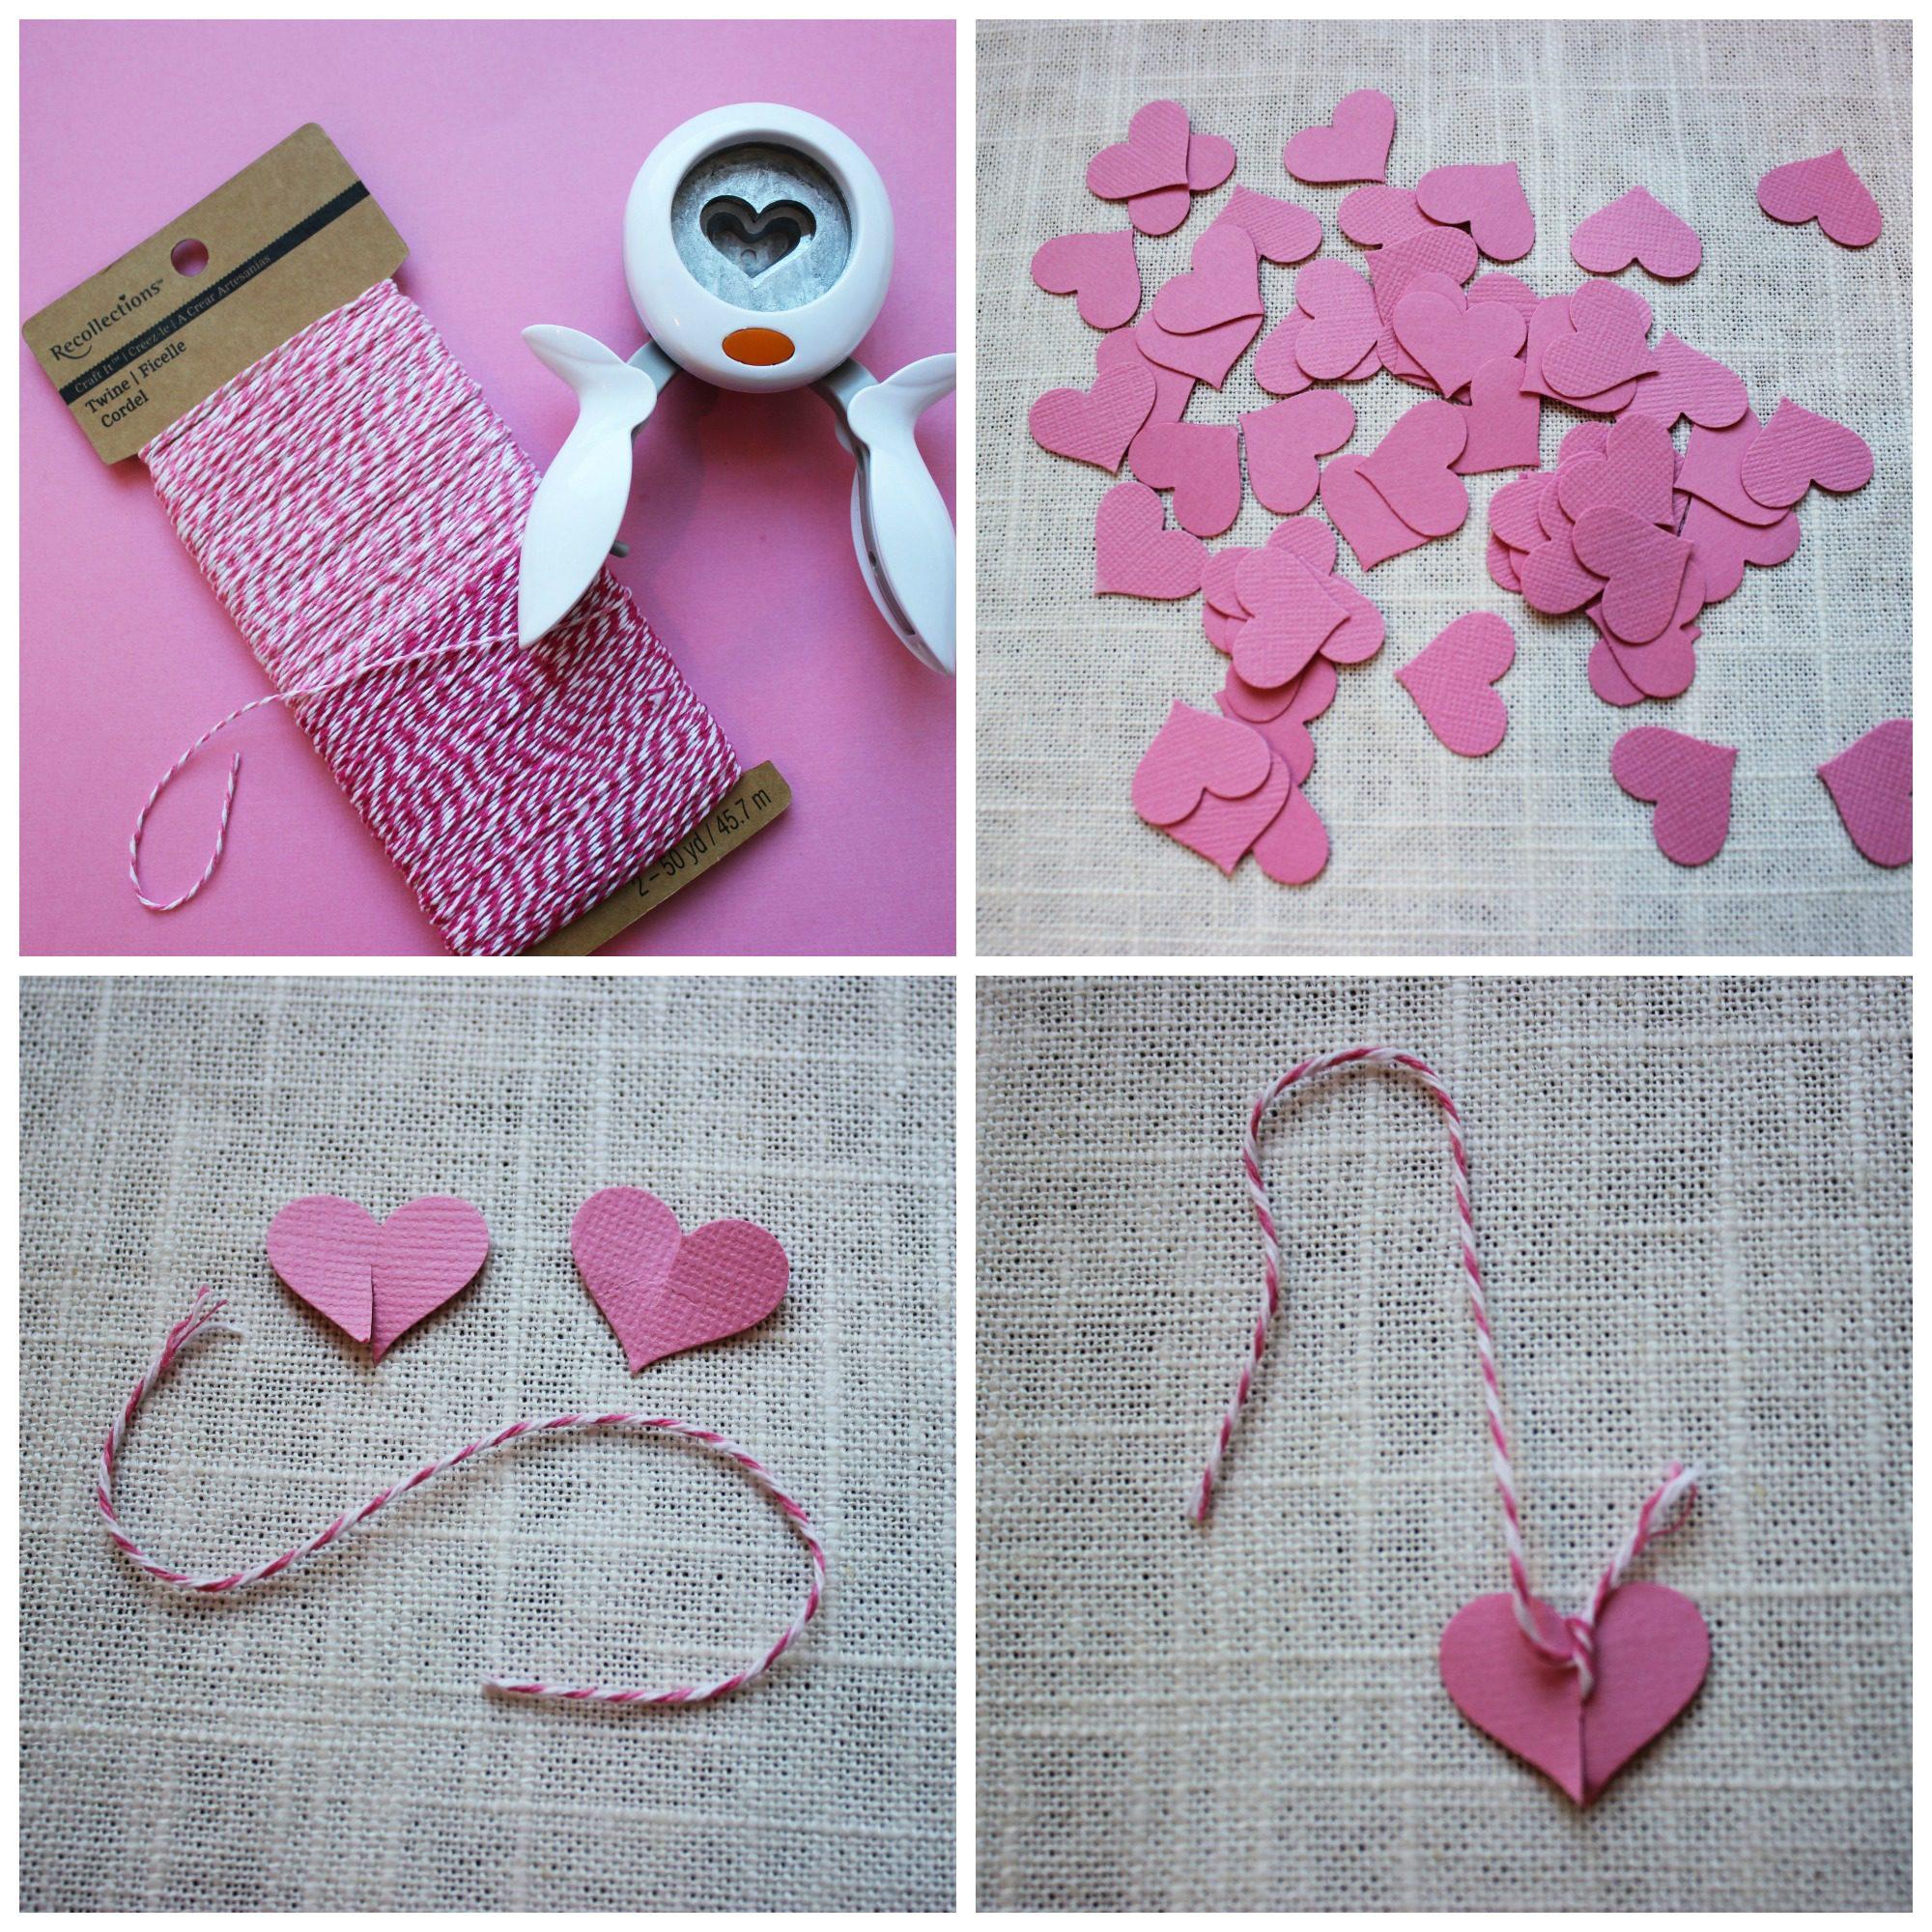 Supplies for VALENTINE'S HEART TREE DIY